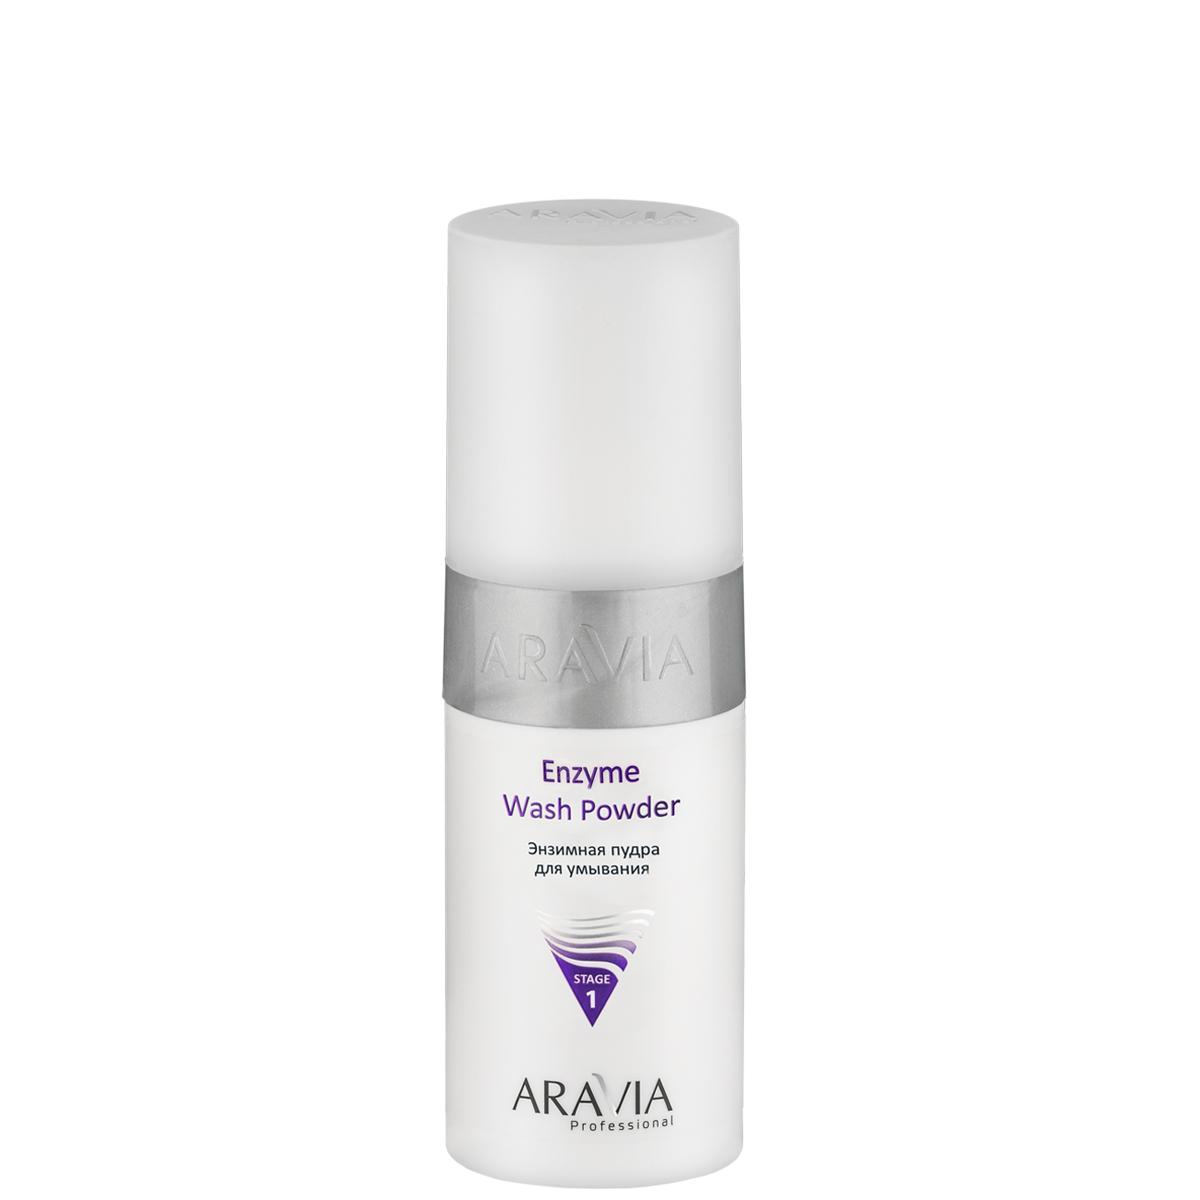 Энзимная пудра ARAVIA Professional Enzyme Wash Powder, для умывания, 150 мл aravia professional papaya enzyme peel